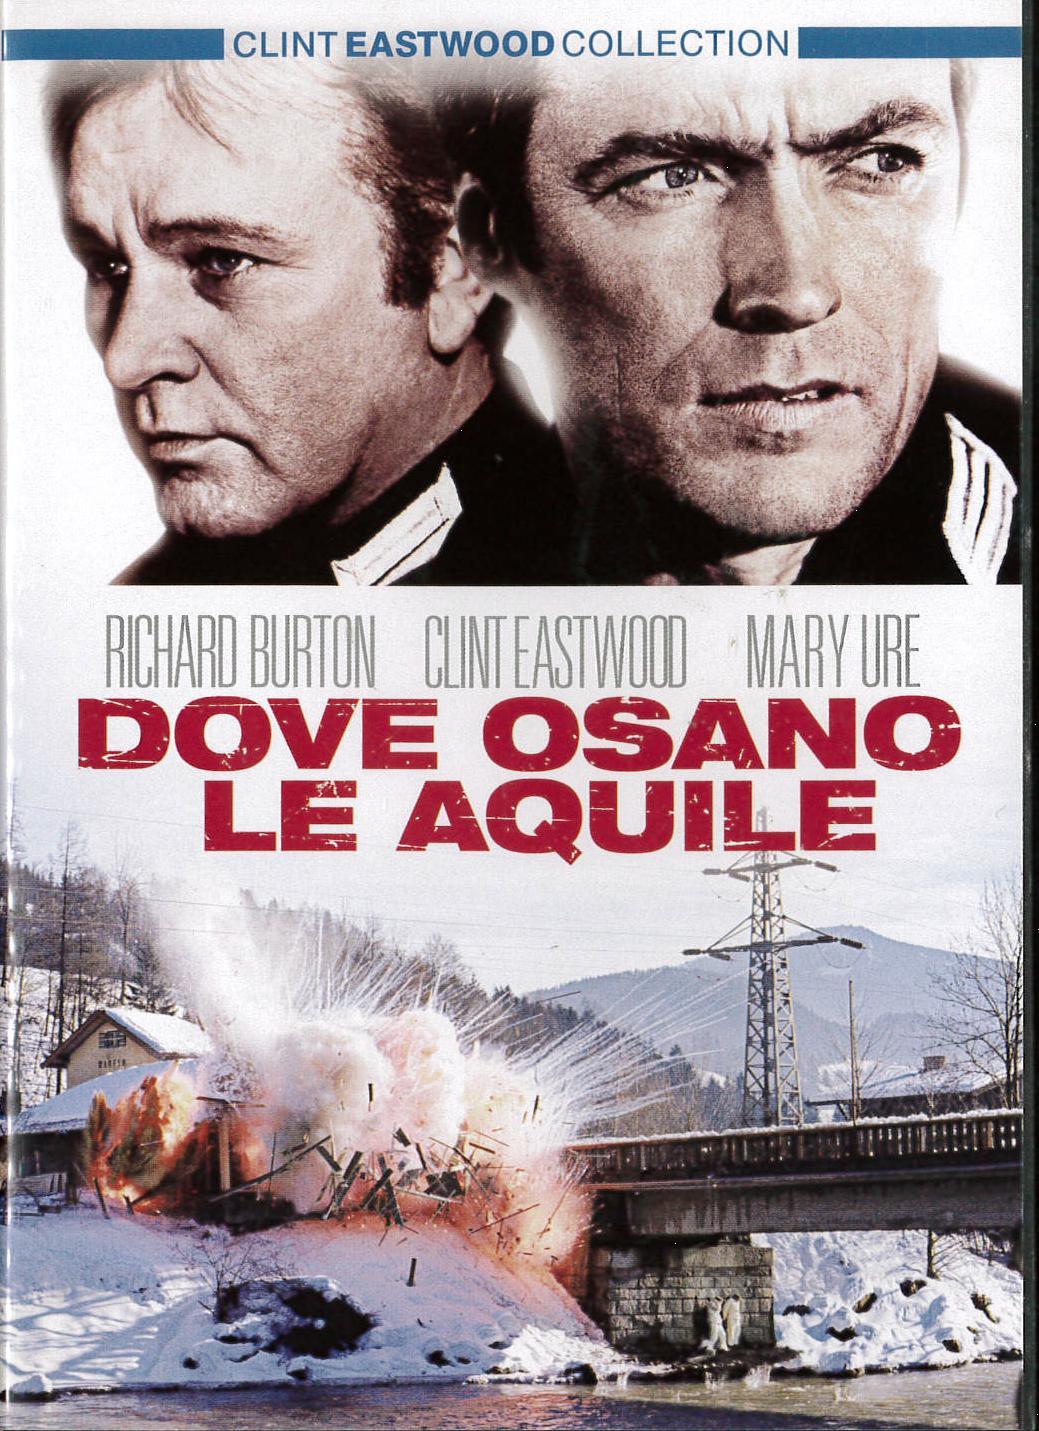 DOVE OSANO LE AQUILE (DVD)